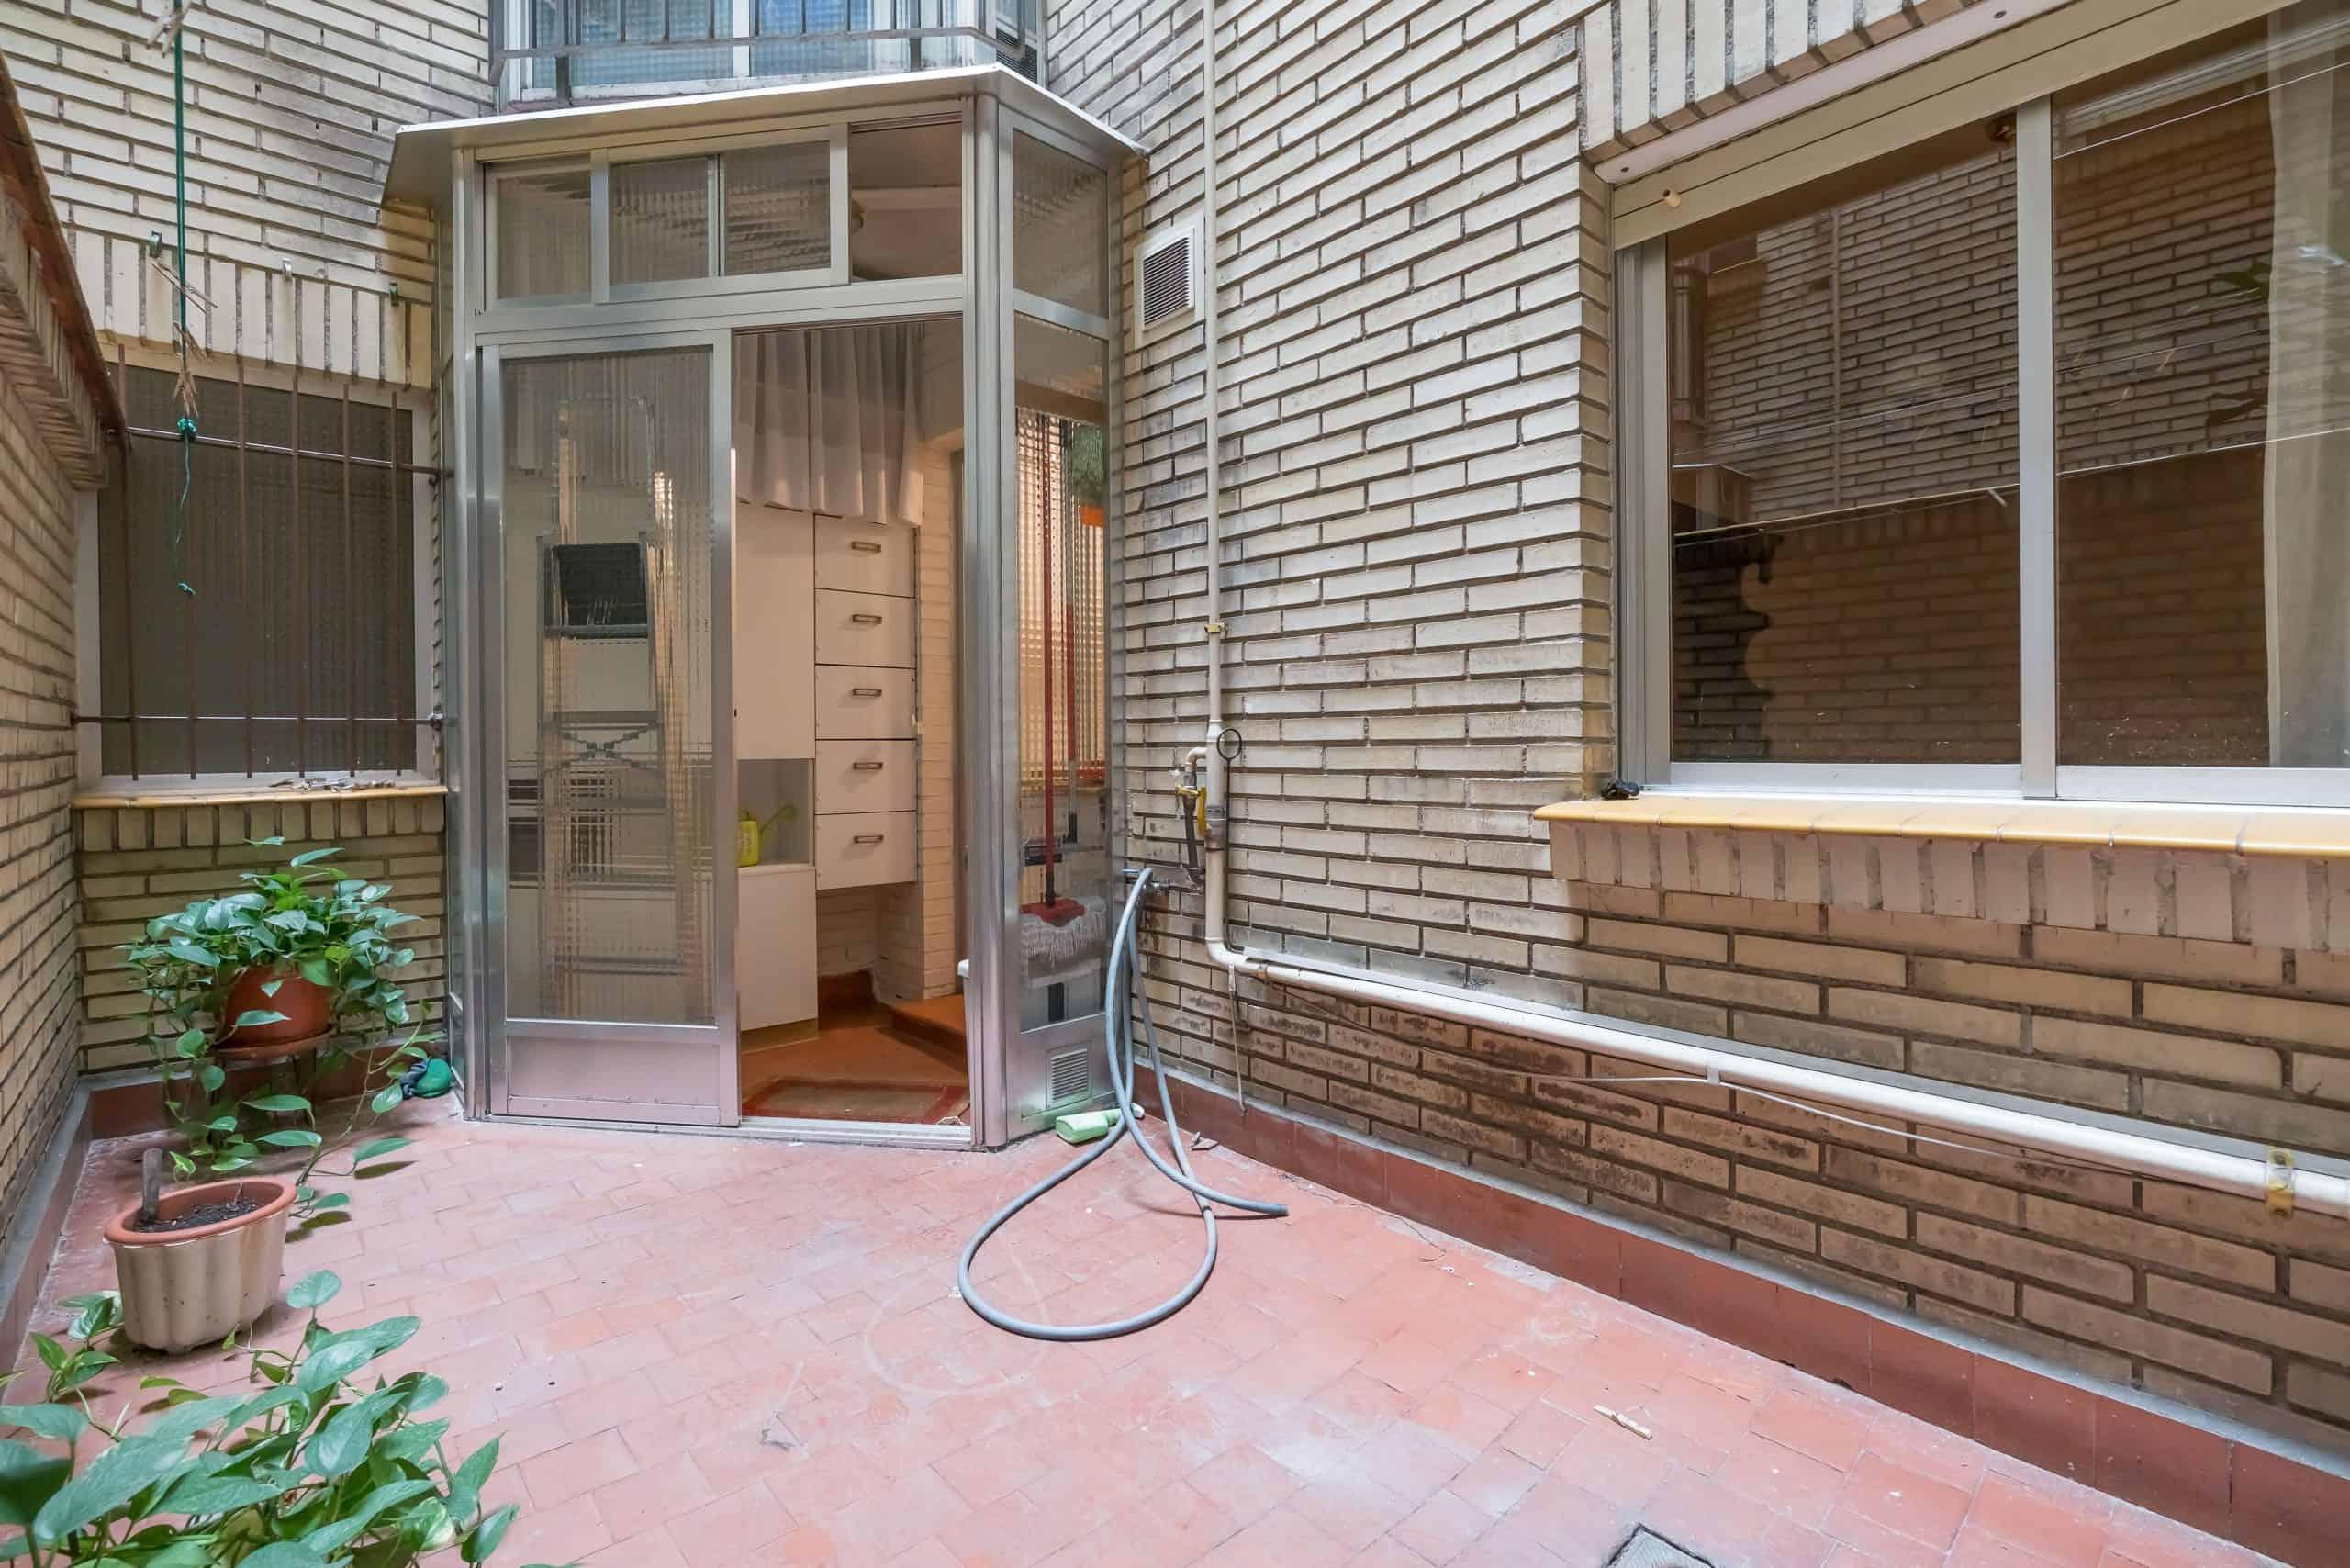 Agencia Inmobiliaria de Madrid-FUTUROCASA-Zona ARGANZUELA-EMBAJADORES-LEGAZPI -calle tomas borras- patio